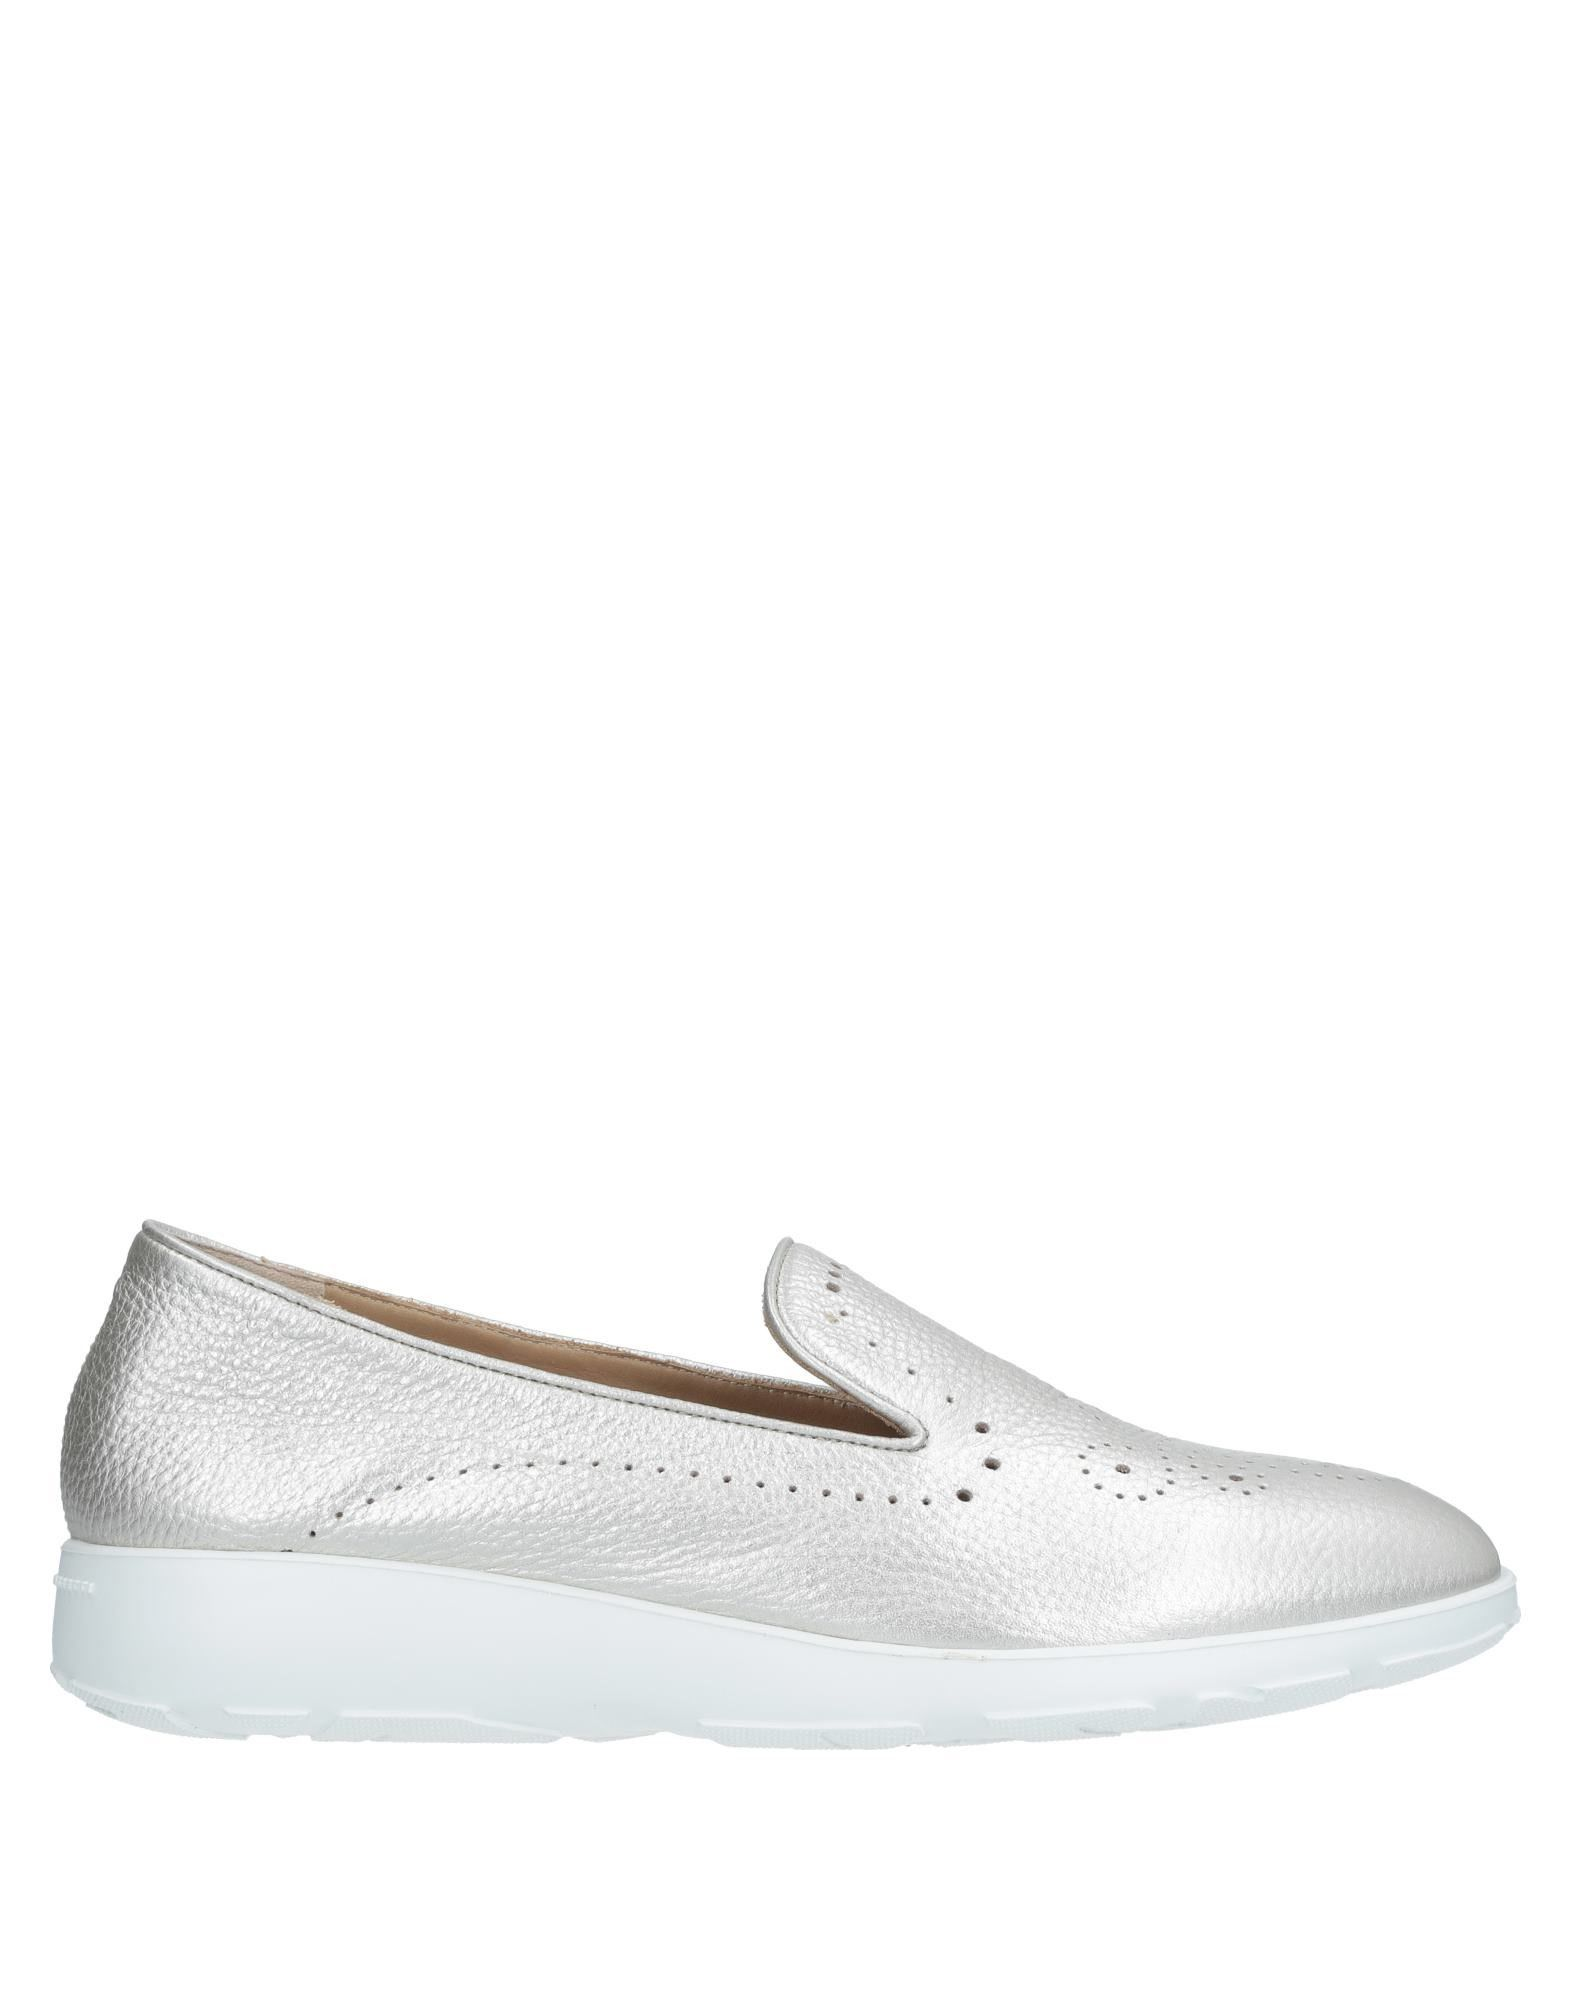 Fratelli Rossetti Mokassins Damen  11530060RSGut aussehende strapazierfähige Schuhe